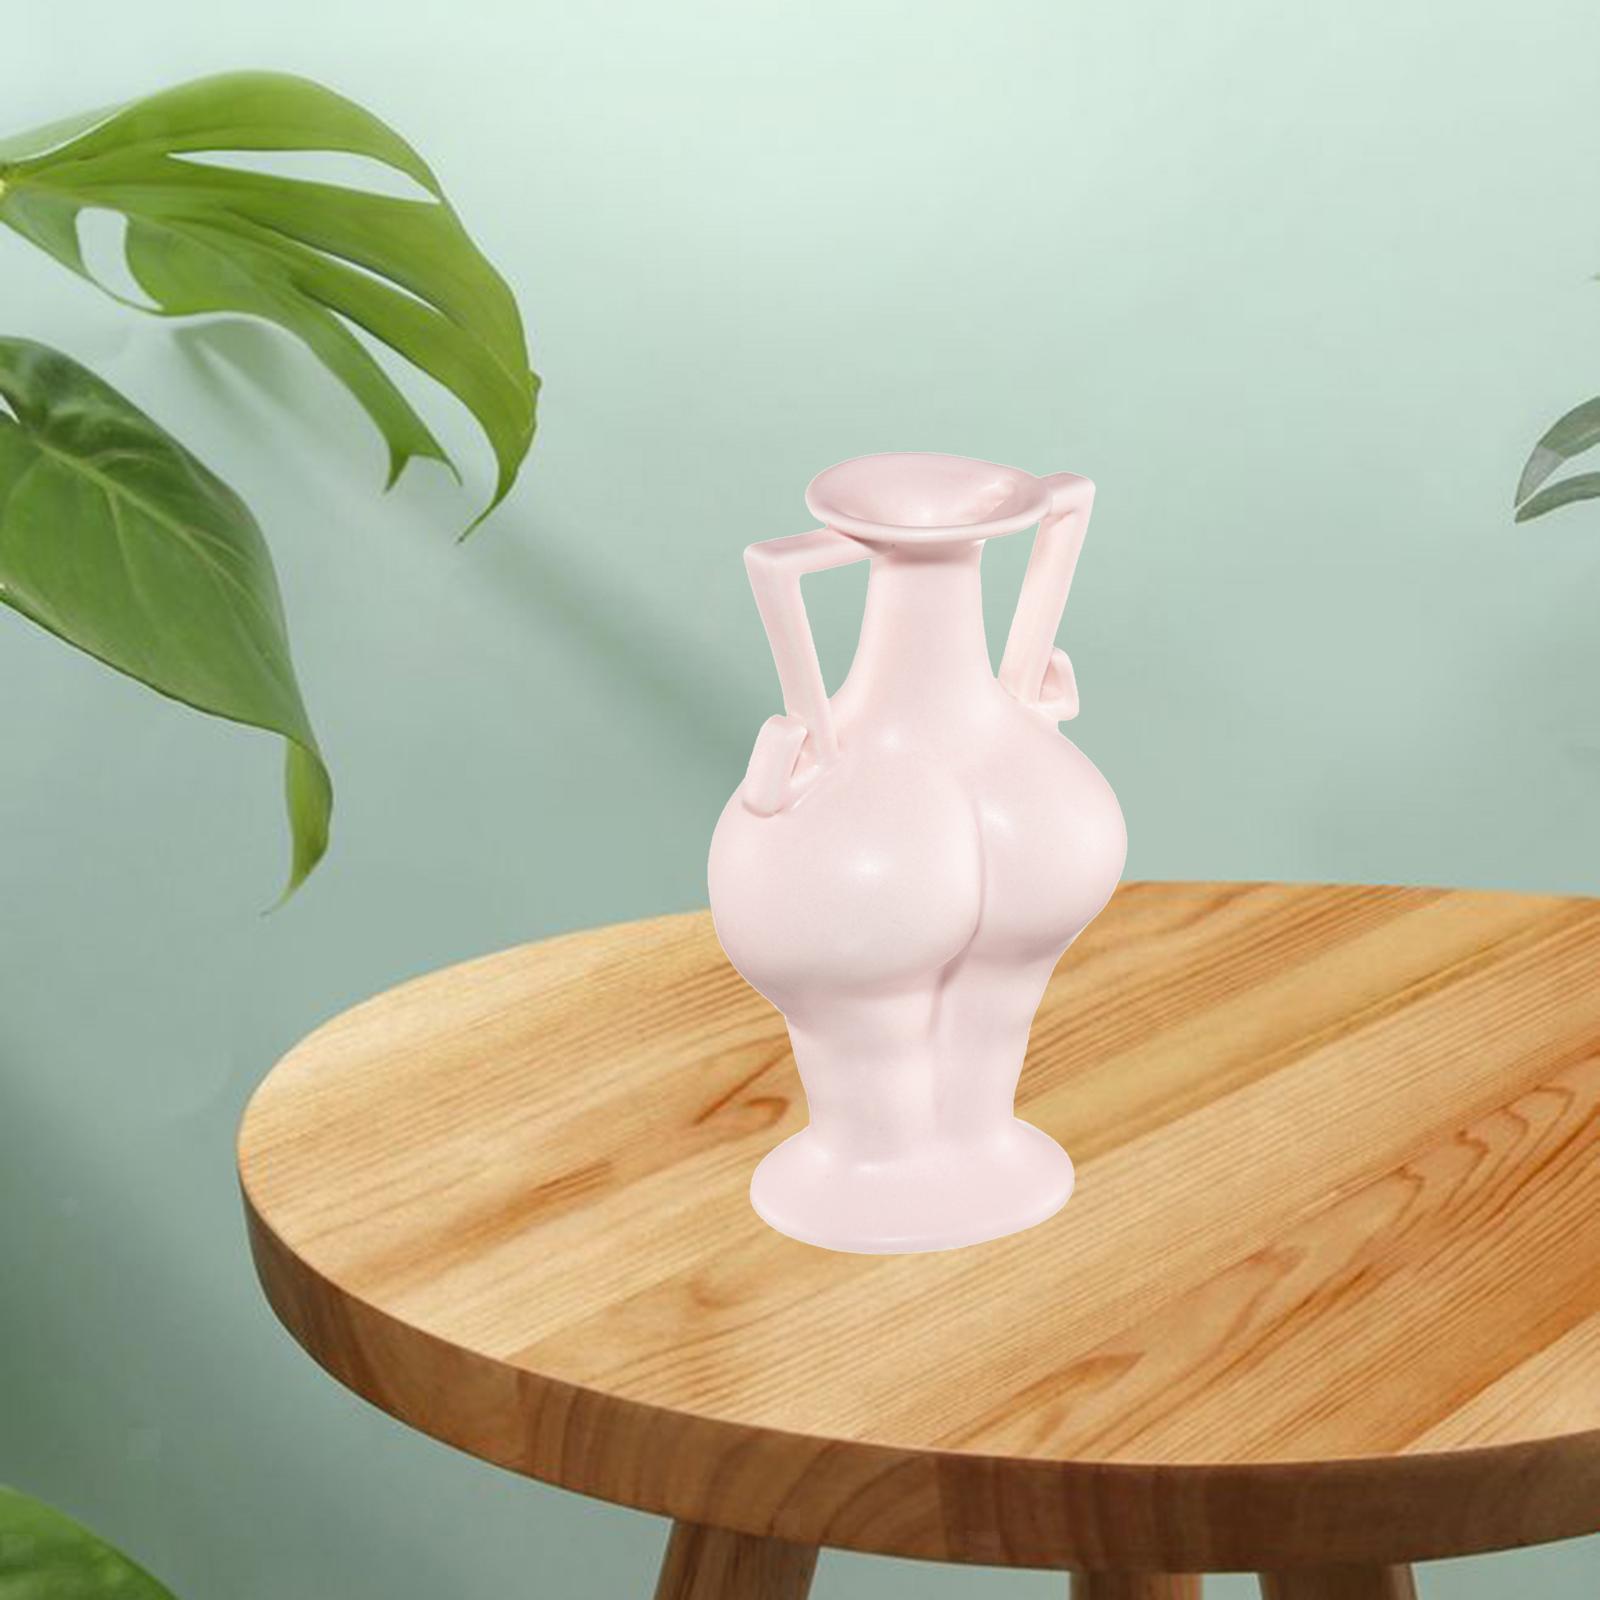 Indexbild 40 - Blumenvase Keramik Blumentöpfe Trockenblumenhalter Pflanzenvasen Wohnkultur